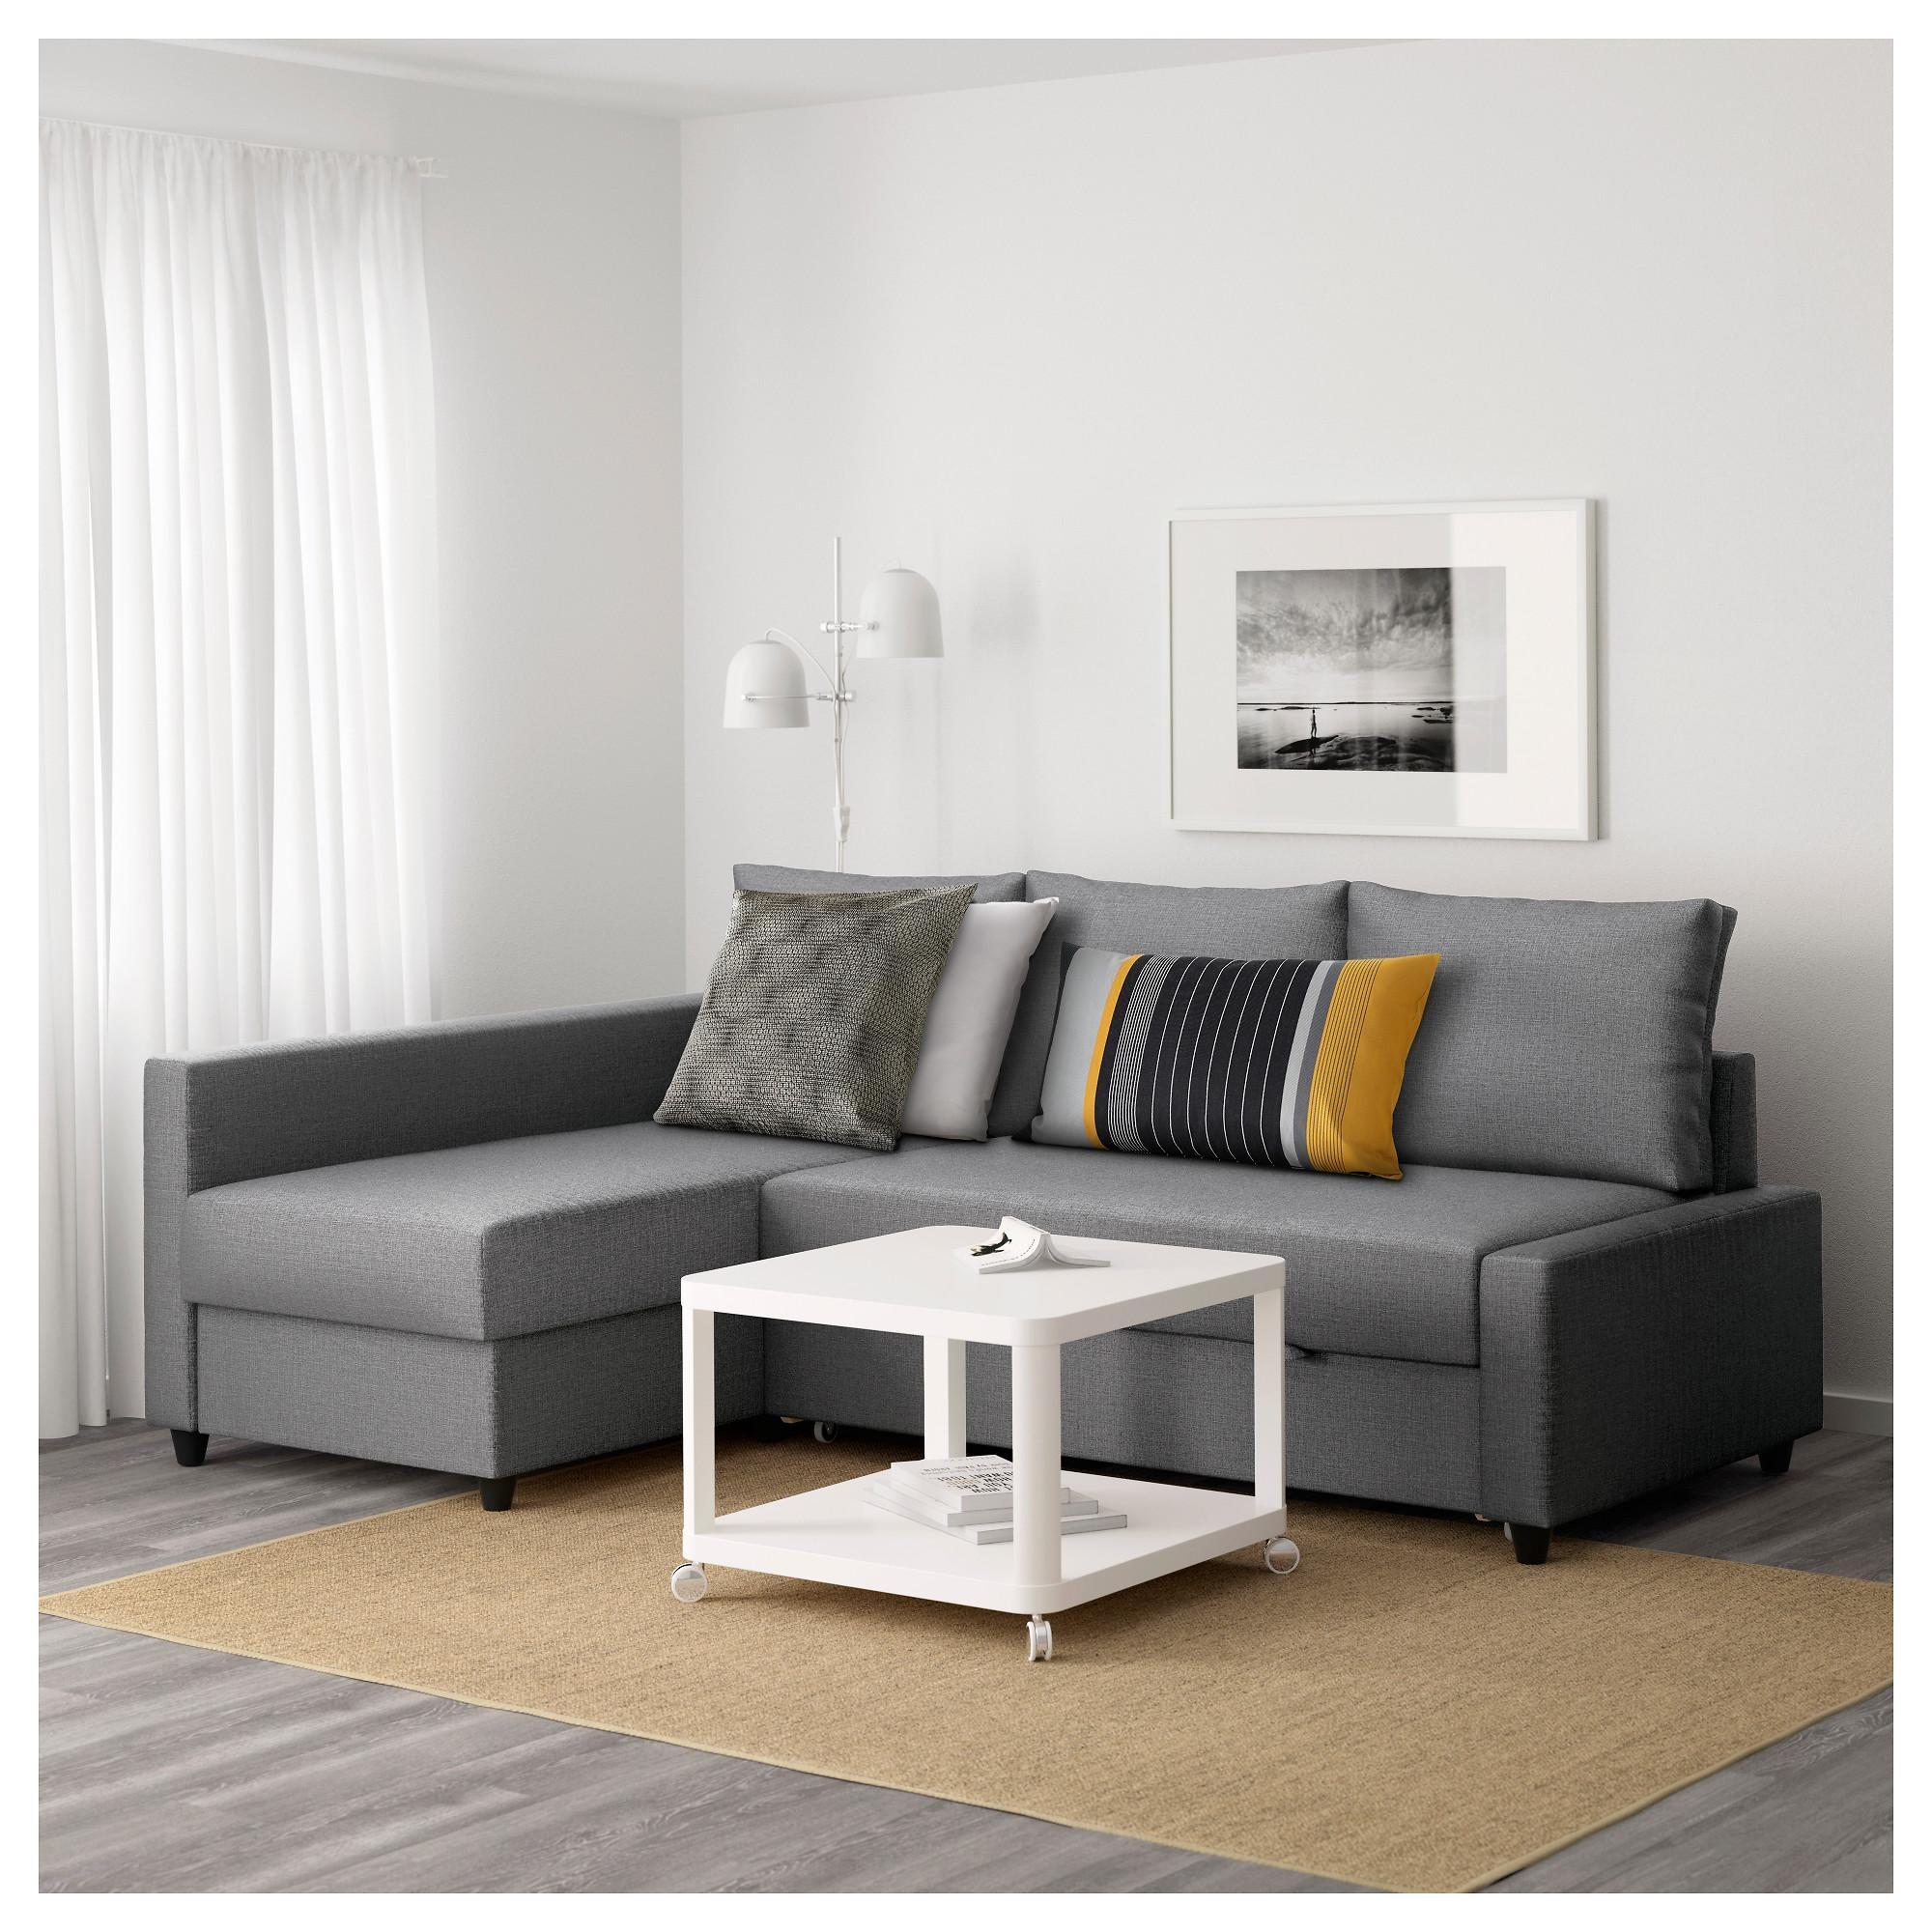 Friheten Corner Sofa Bed With Storage Skiftebo Dark Grey – Ikea Pertaining To Ikea Corner Sofa Bed With Storage (Image 8 of 20)